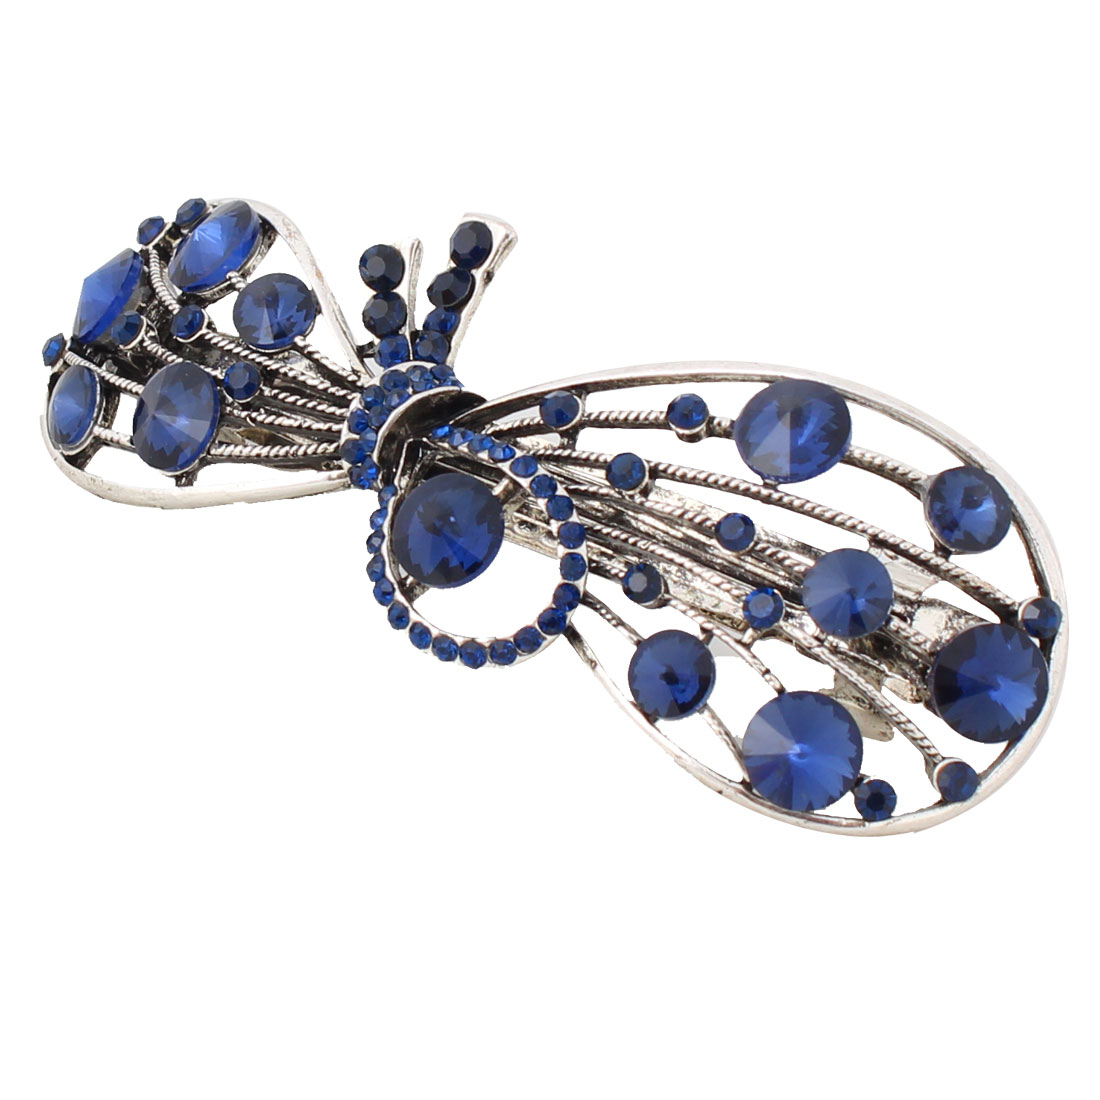 Women Metal Hollow Bowknot Adorn Shining Rhinestone Welt Hair Clip Barrette Blue